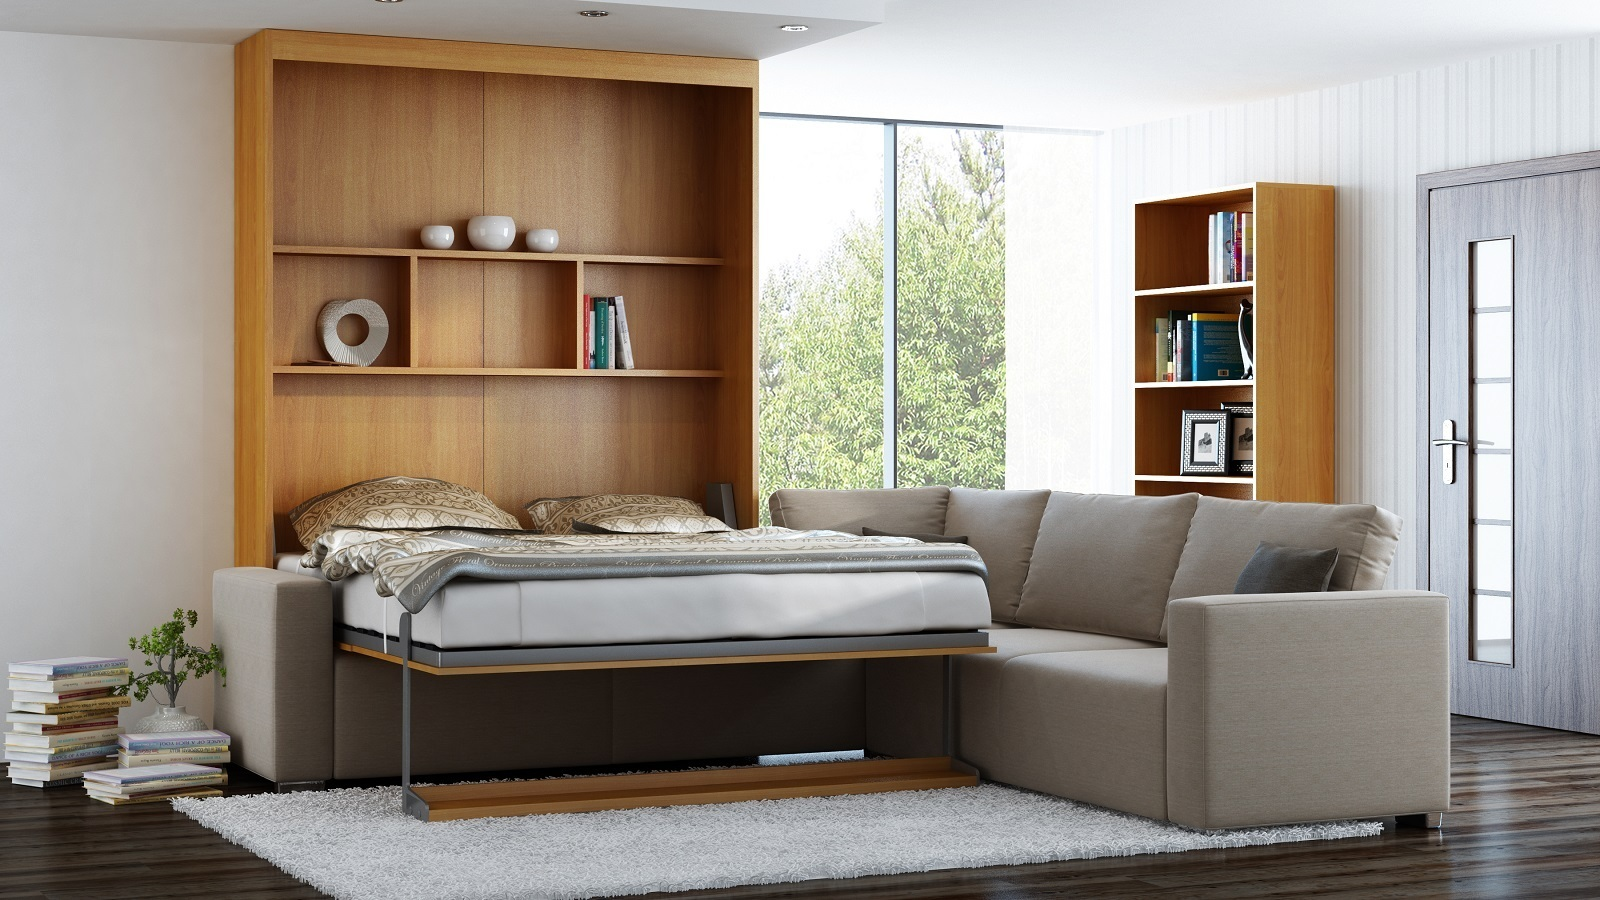 wandbett mit sofa ecke leggio linea std std 160 x 200 cm kirsche. Black Bedroom Furniture Sets. Home Design Ideas